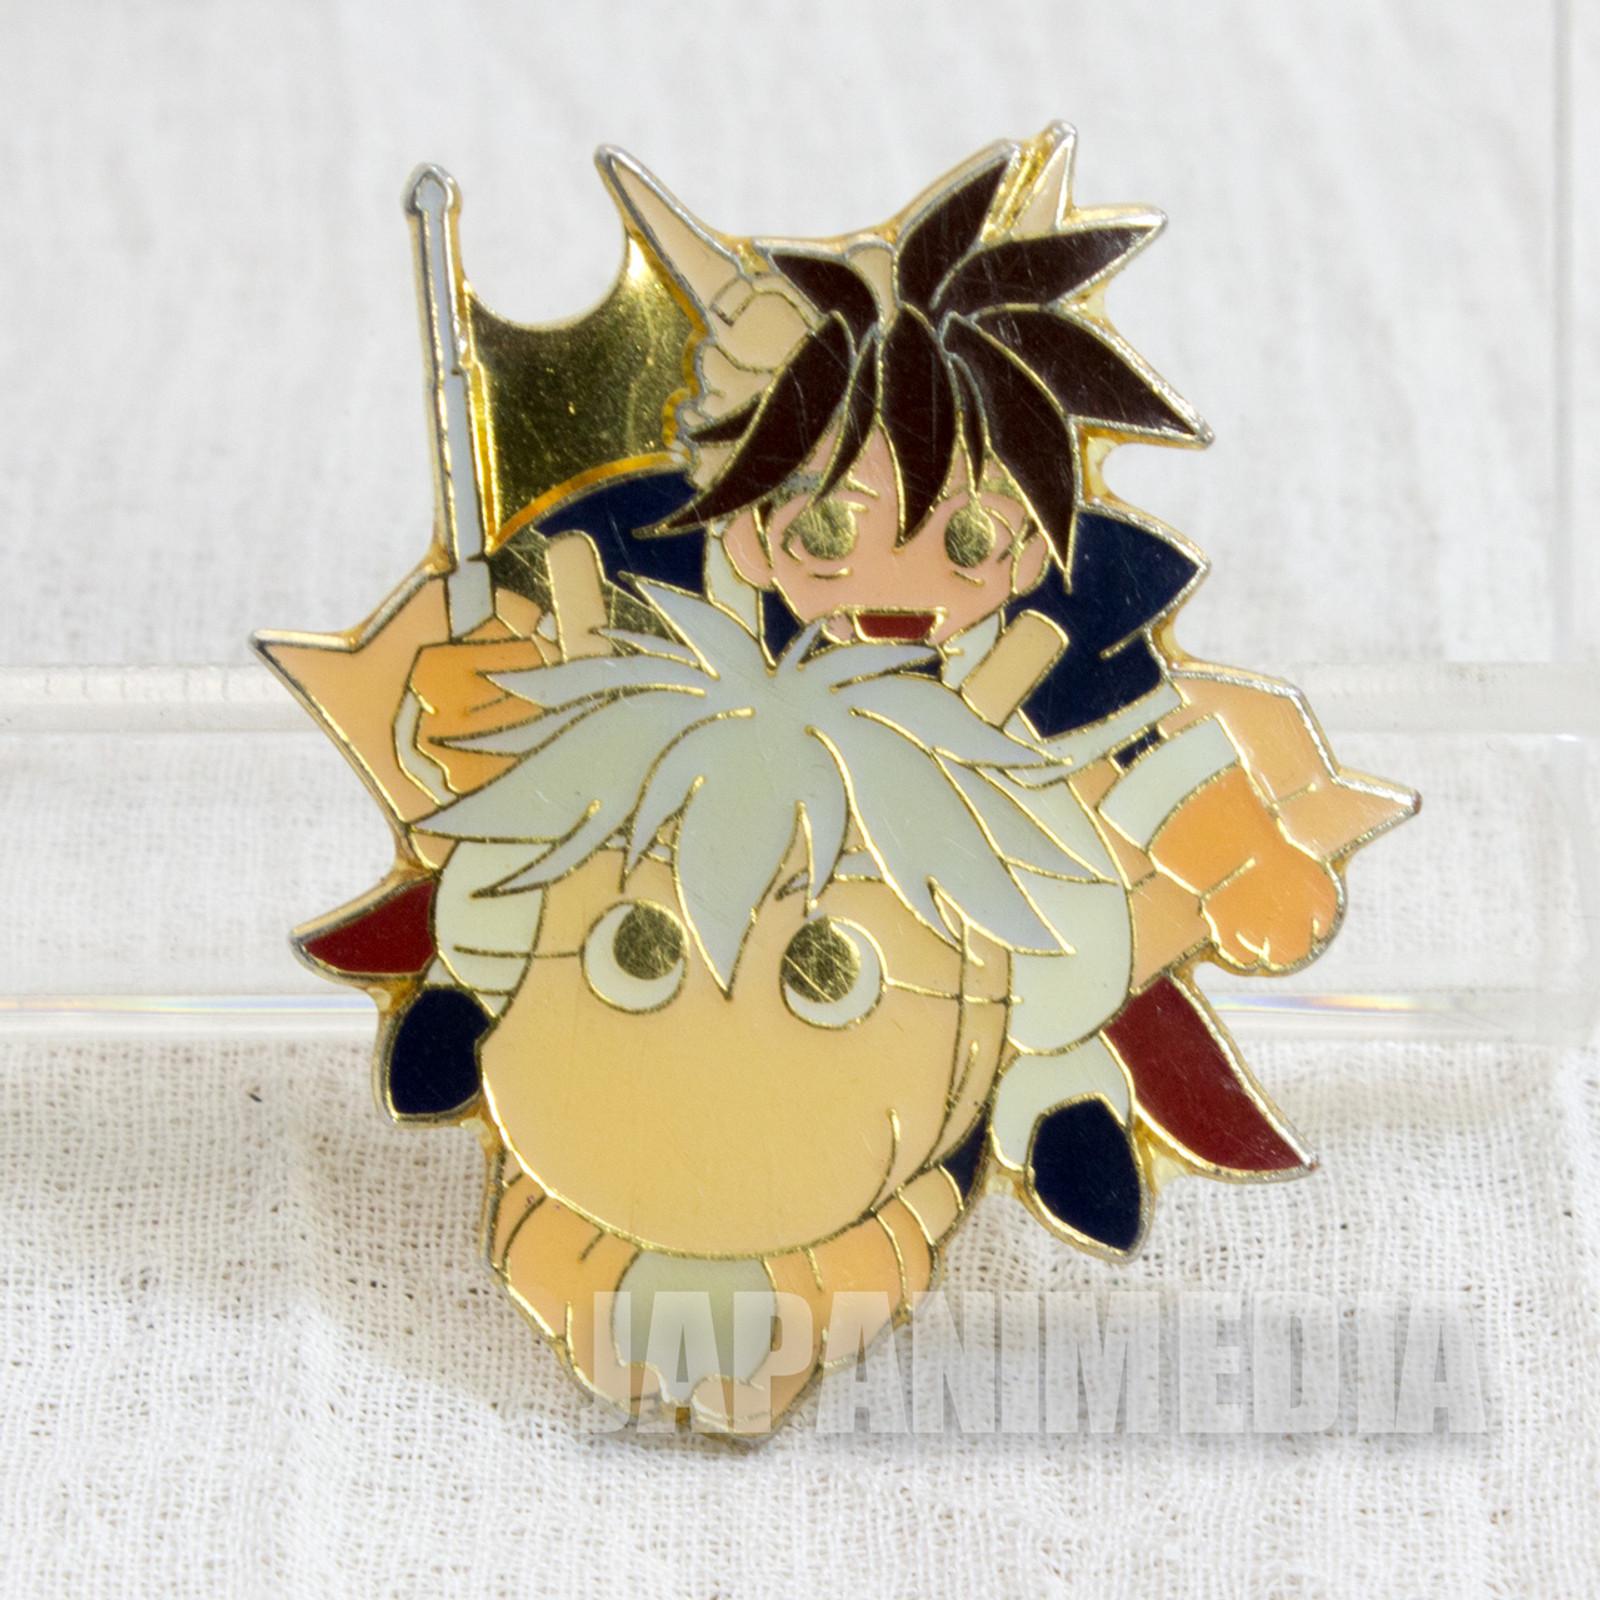 Senkaiden Hoshin Engi Taikobo & Supushan Pins JAPAN ANIME MANGA